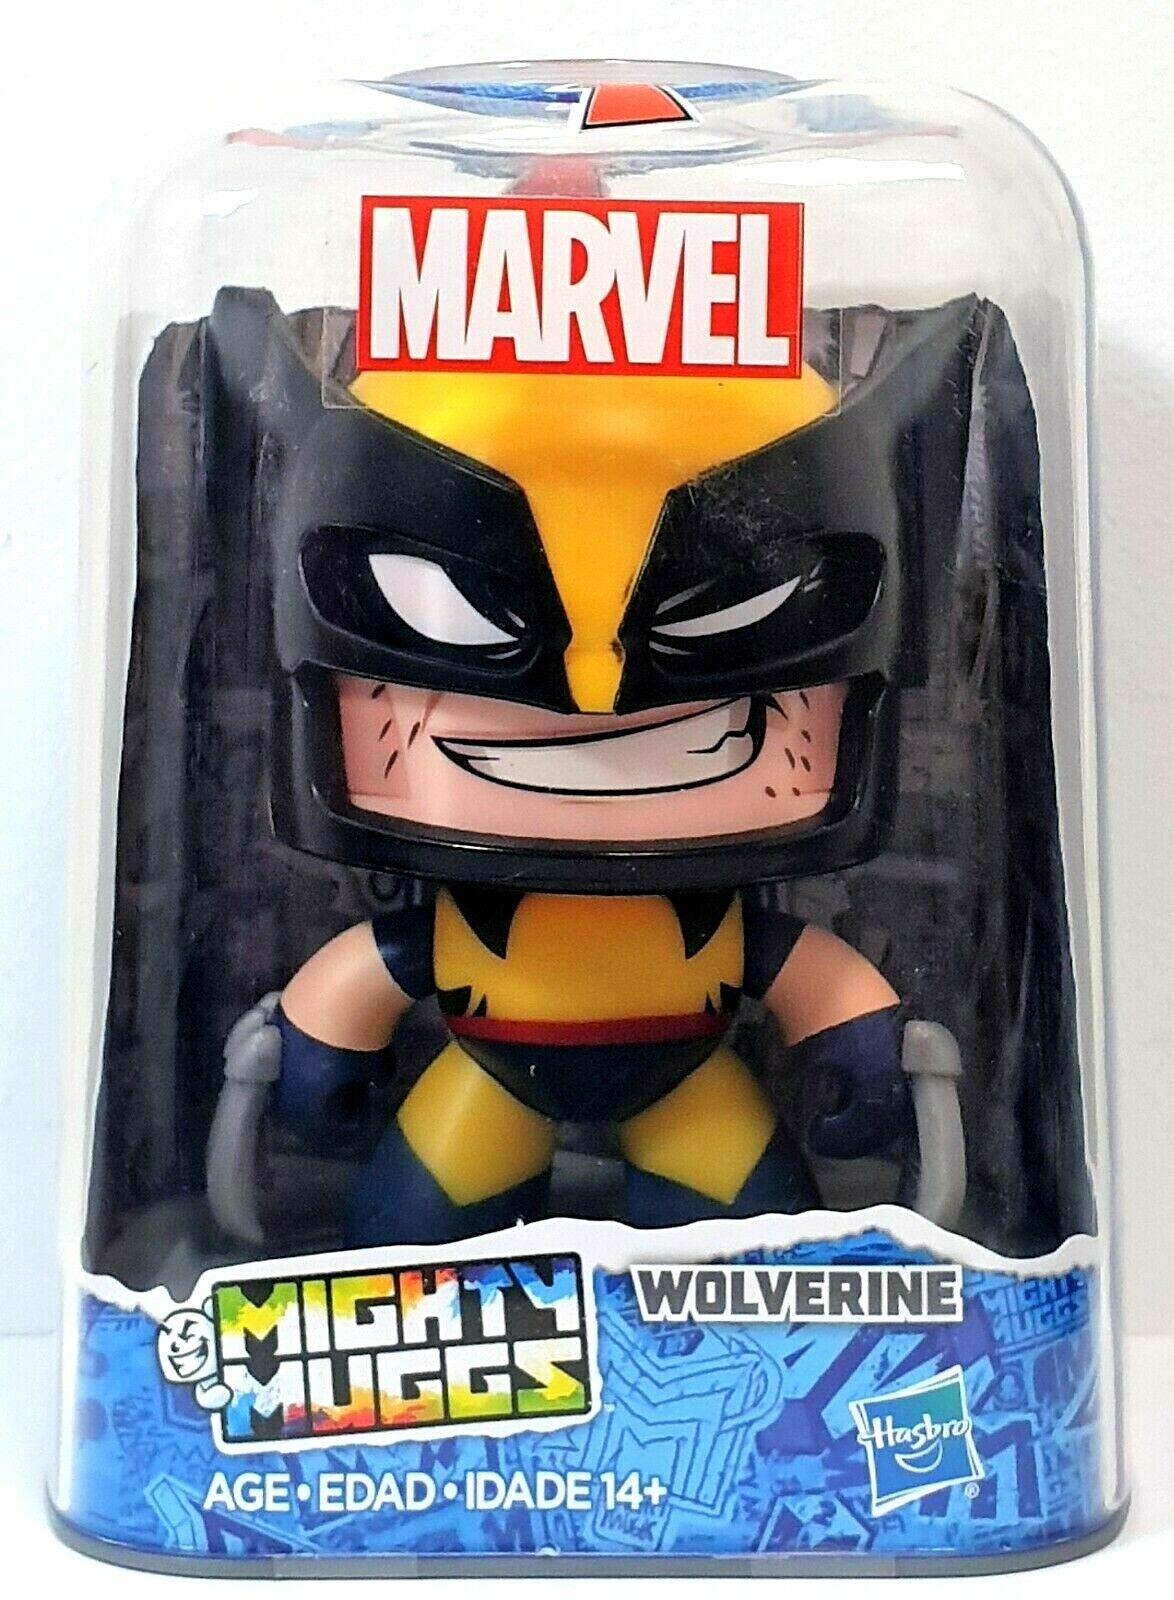 Marvel Mighty Muggs Wolverine Age 14 New//Sealed Hasbro